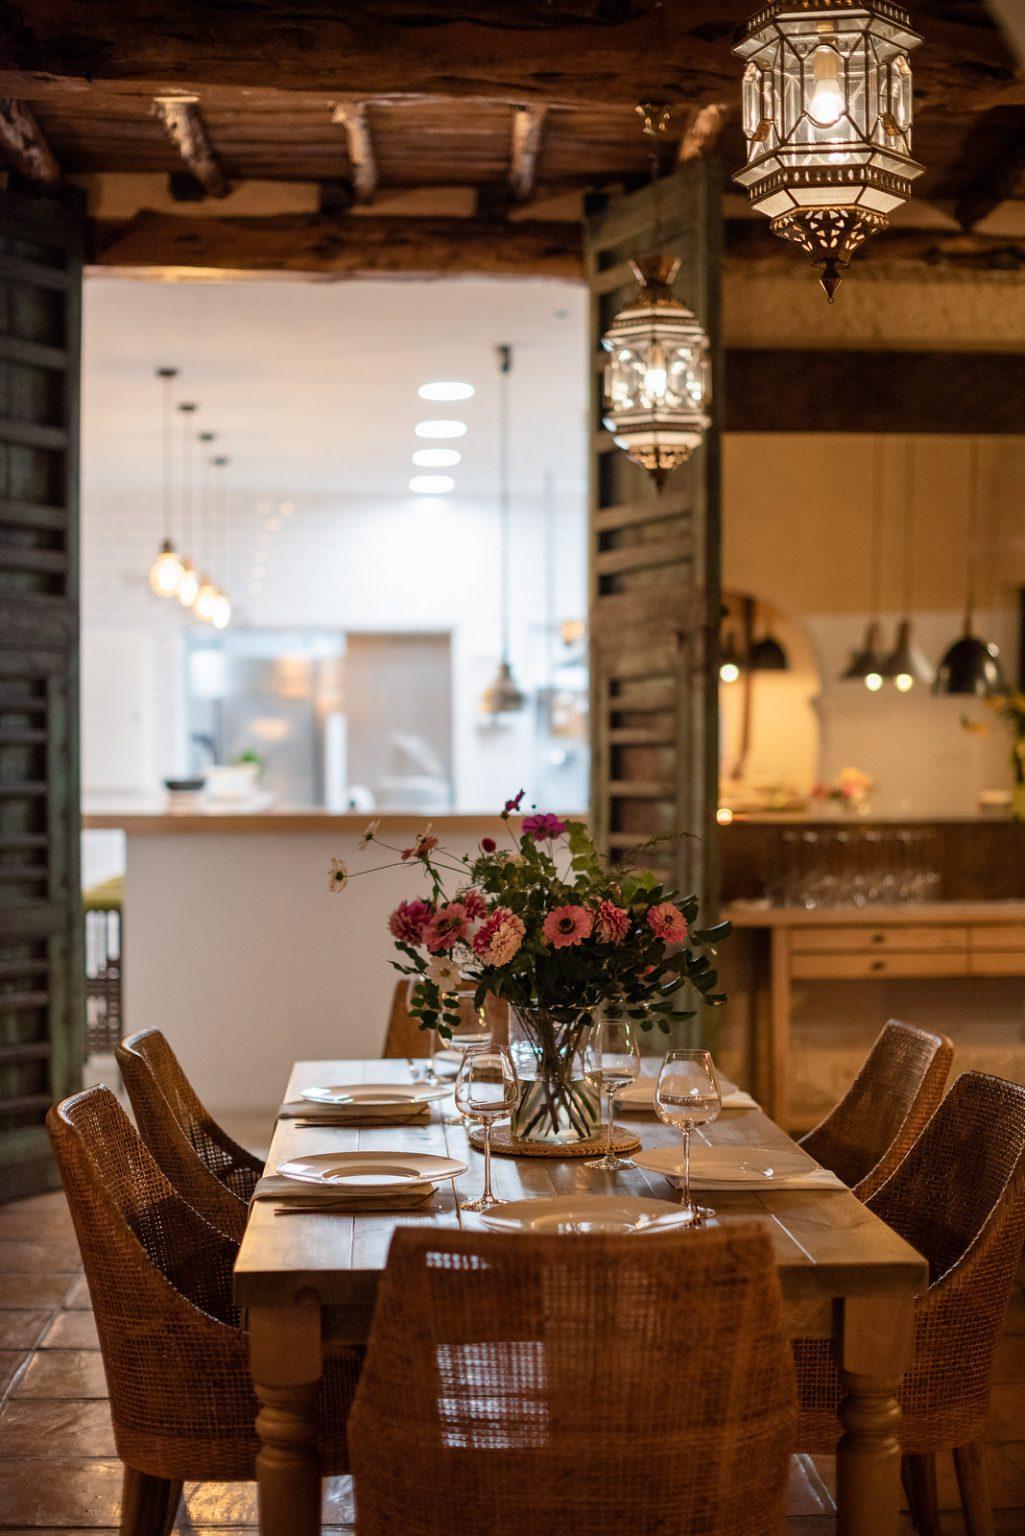 https://www.white-ibiza.com/wp-content/uploads/2020/11/cas-gasi-restaurant-2020-05-1025x1536.jpg